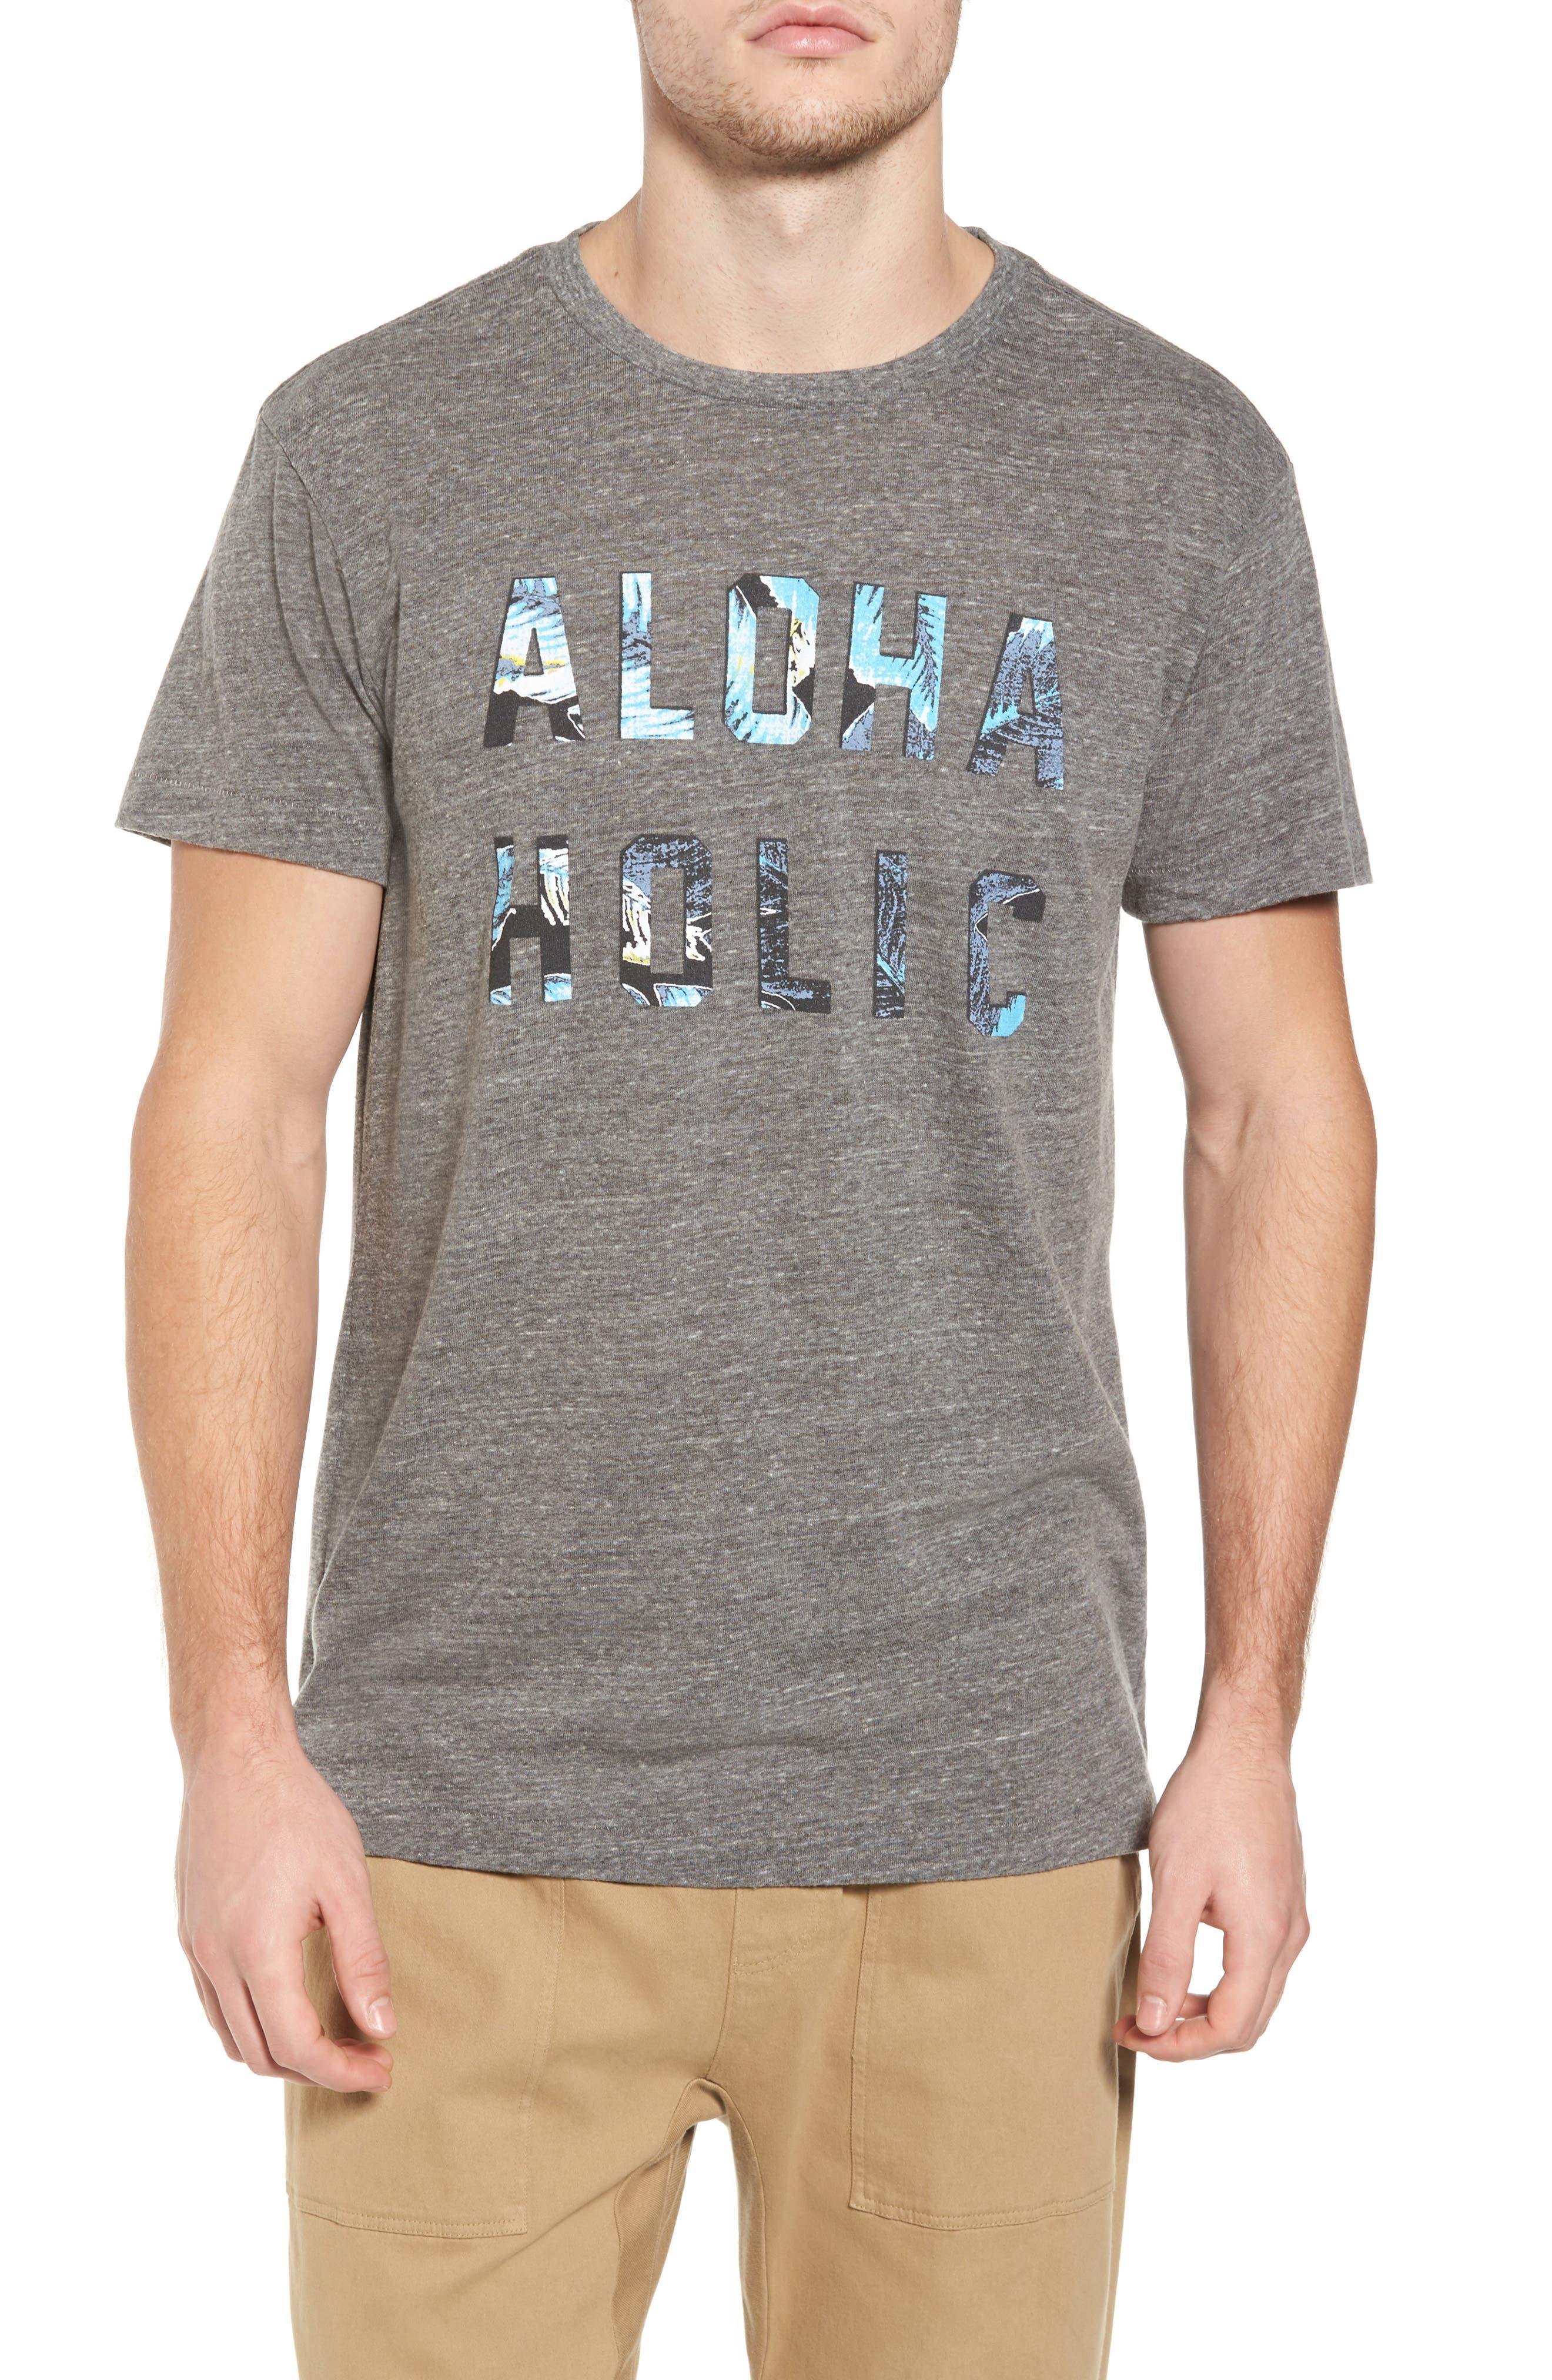 Alternate Image 1 Selected - Sol Angeles Aloha Holic Graphic T-Shirt